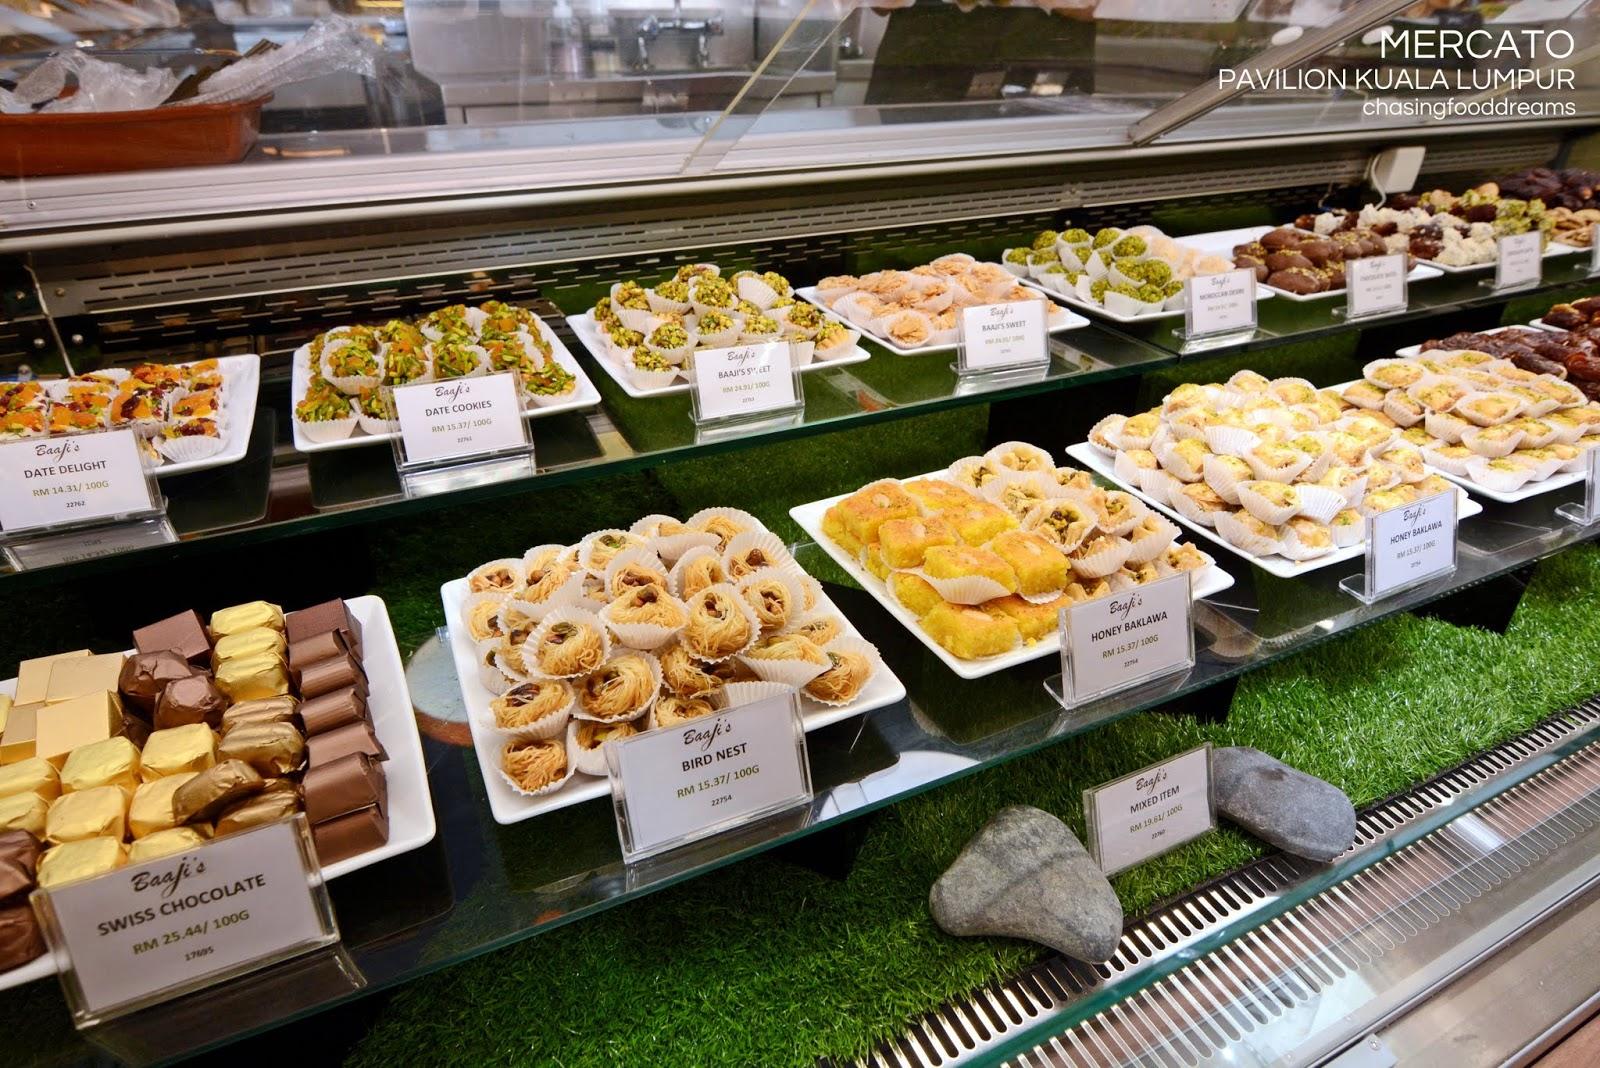 Chasing Food Dreams The All New Mercato Pavilion Kuala Lumpur